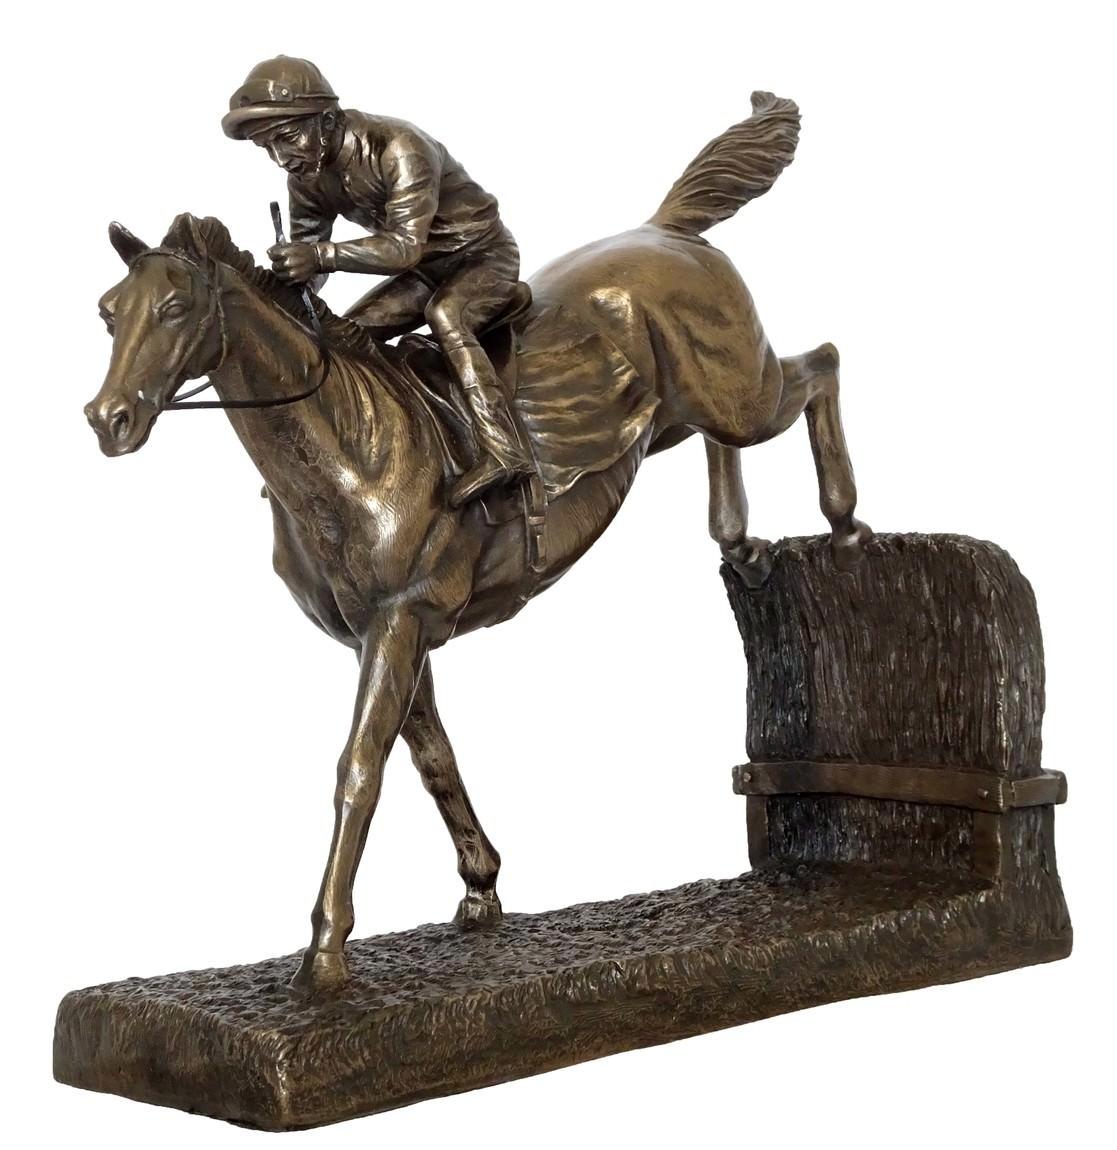 Veronese Cold Cast Bronze Coated Landing Jockey Figurine